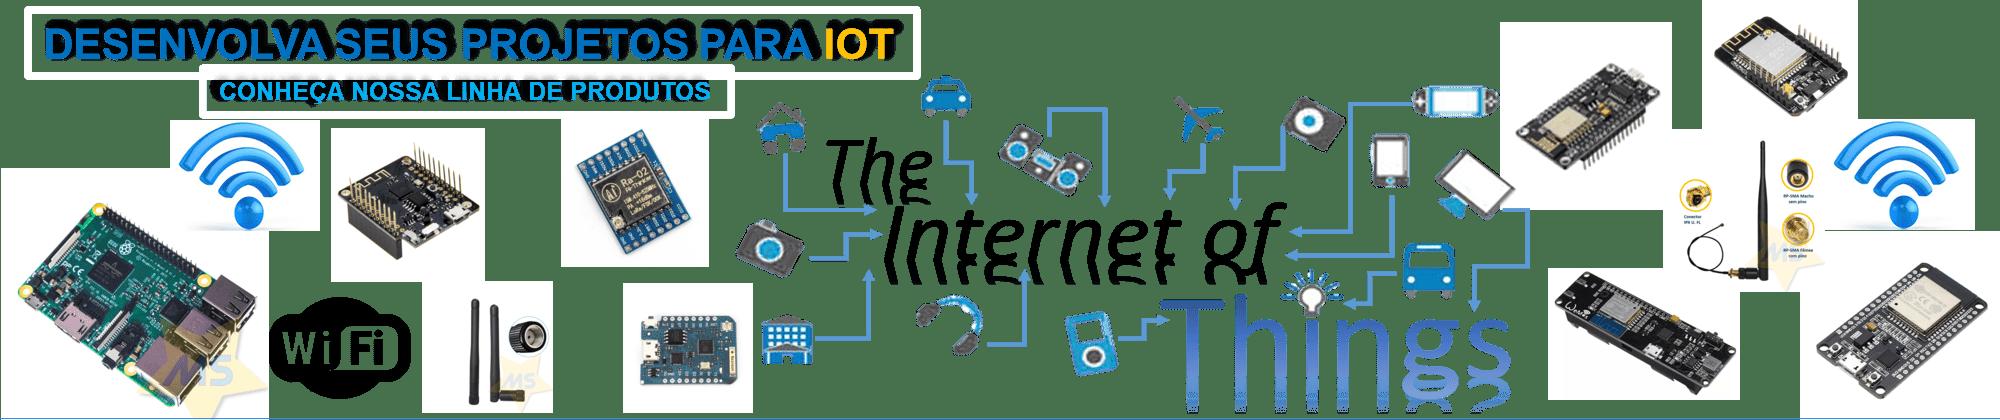 Desenvolva seus Projetos para IoT